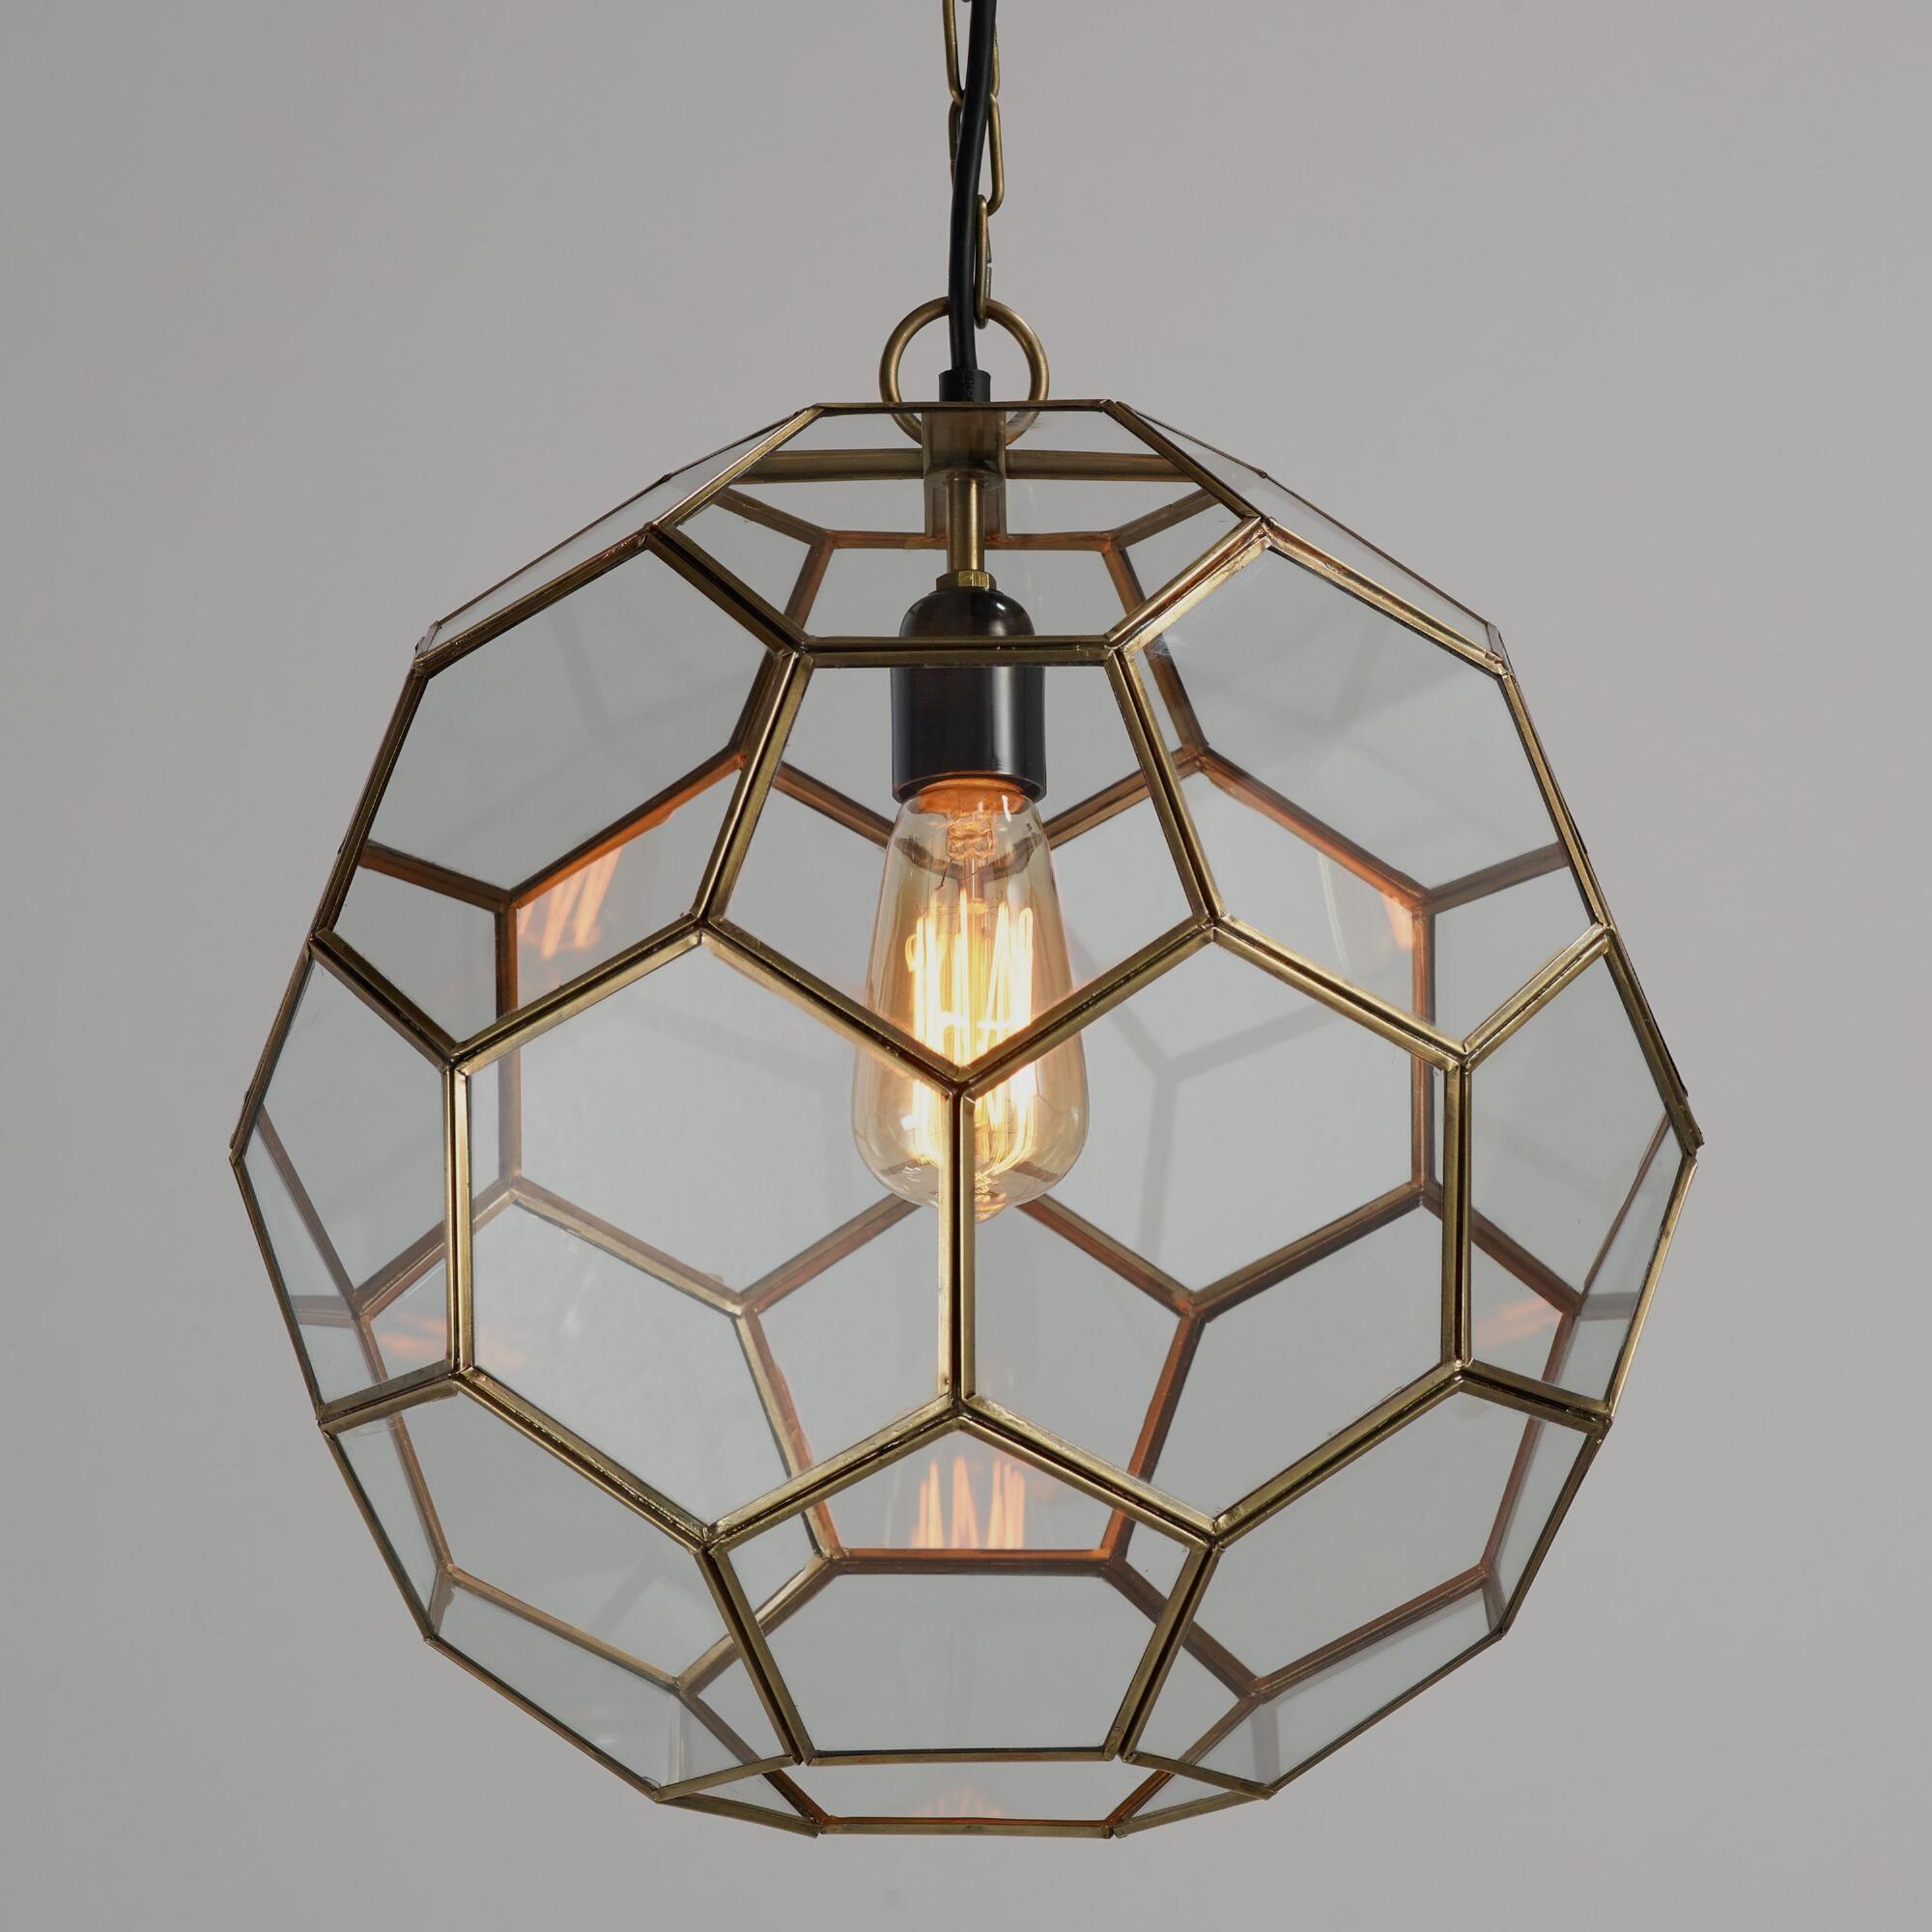 Diy Reclaimed Wood Lamp The Home Depot Diy Workshop The Inspired Room Affordable Pendant Lighting Antique Brass Frame Affordable Pendants